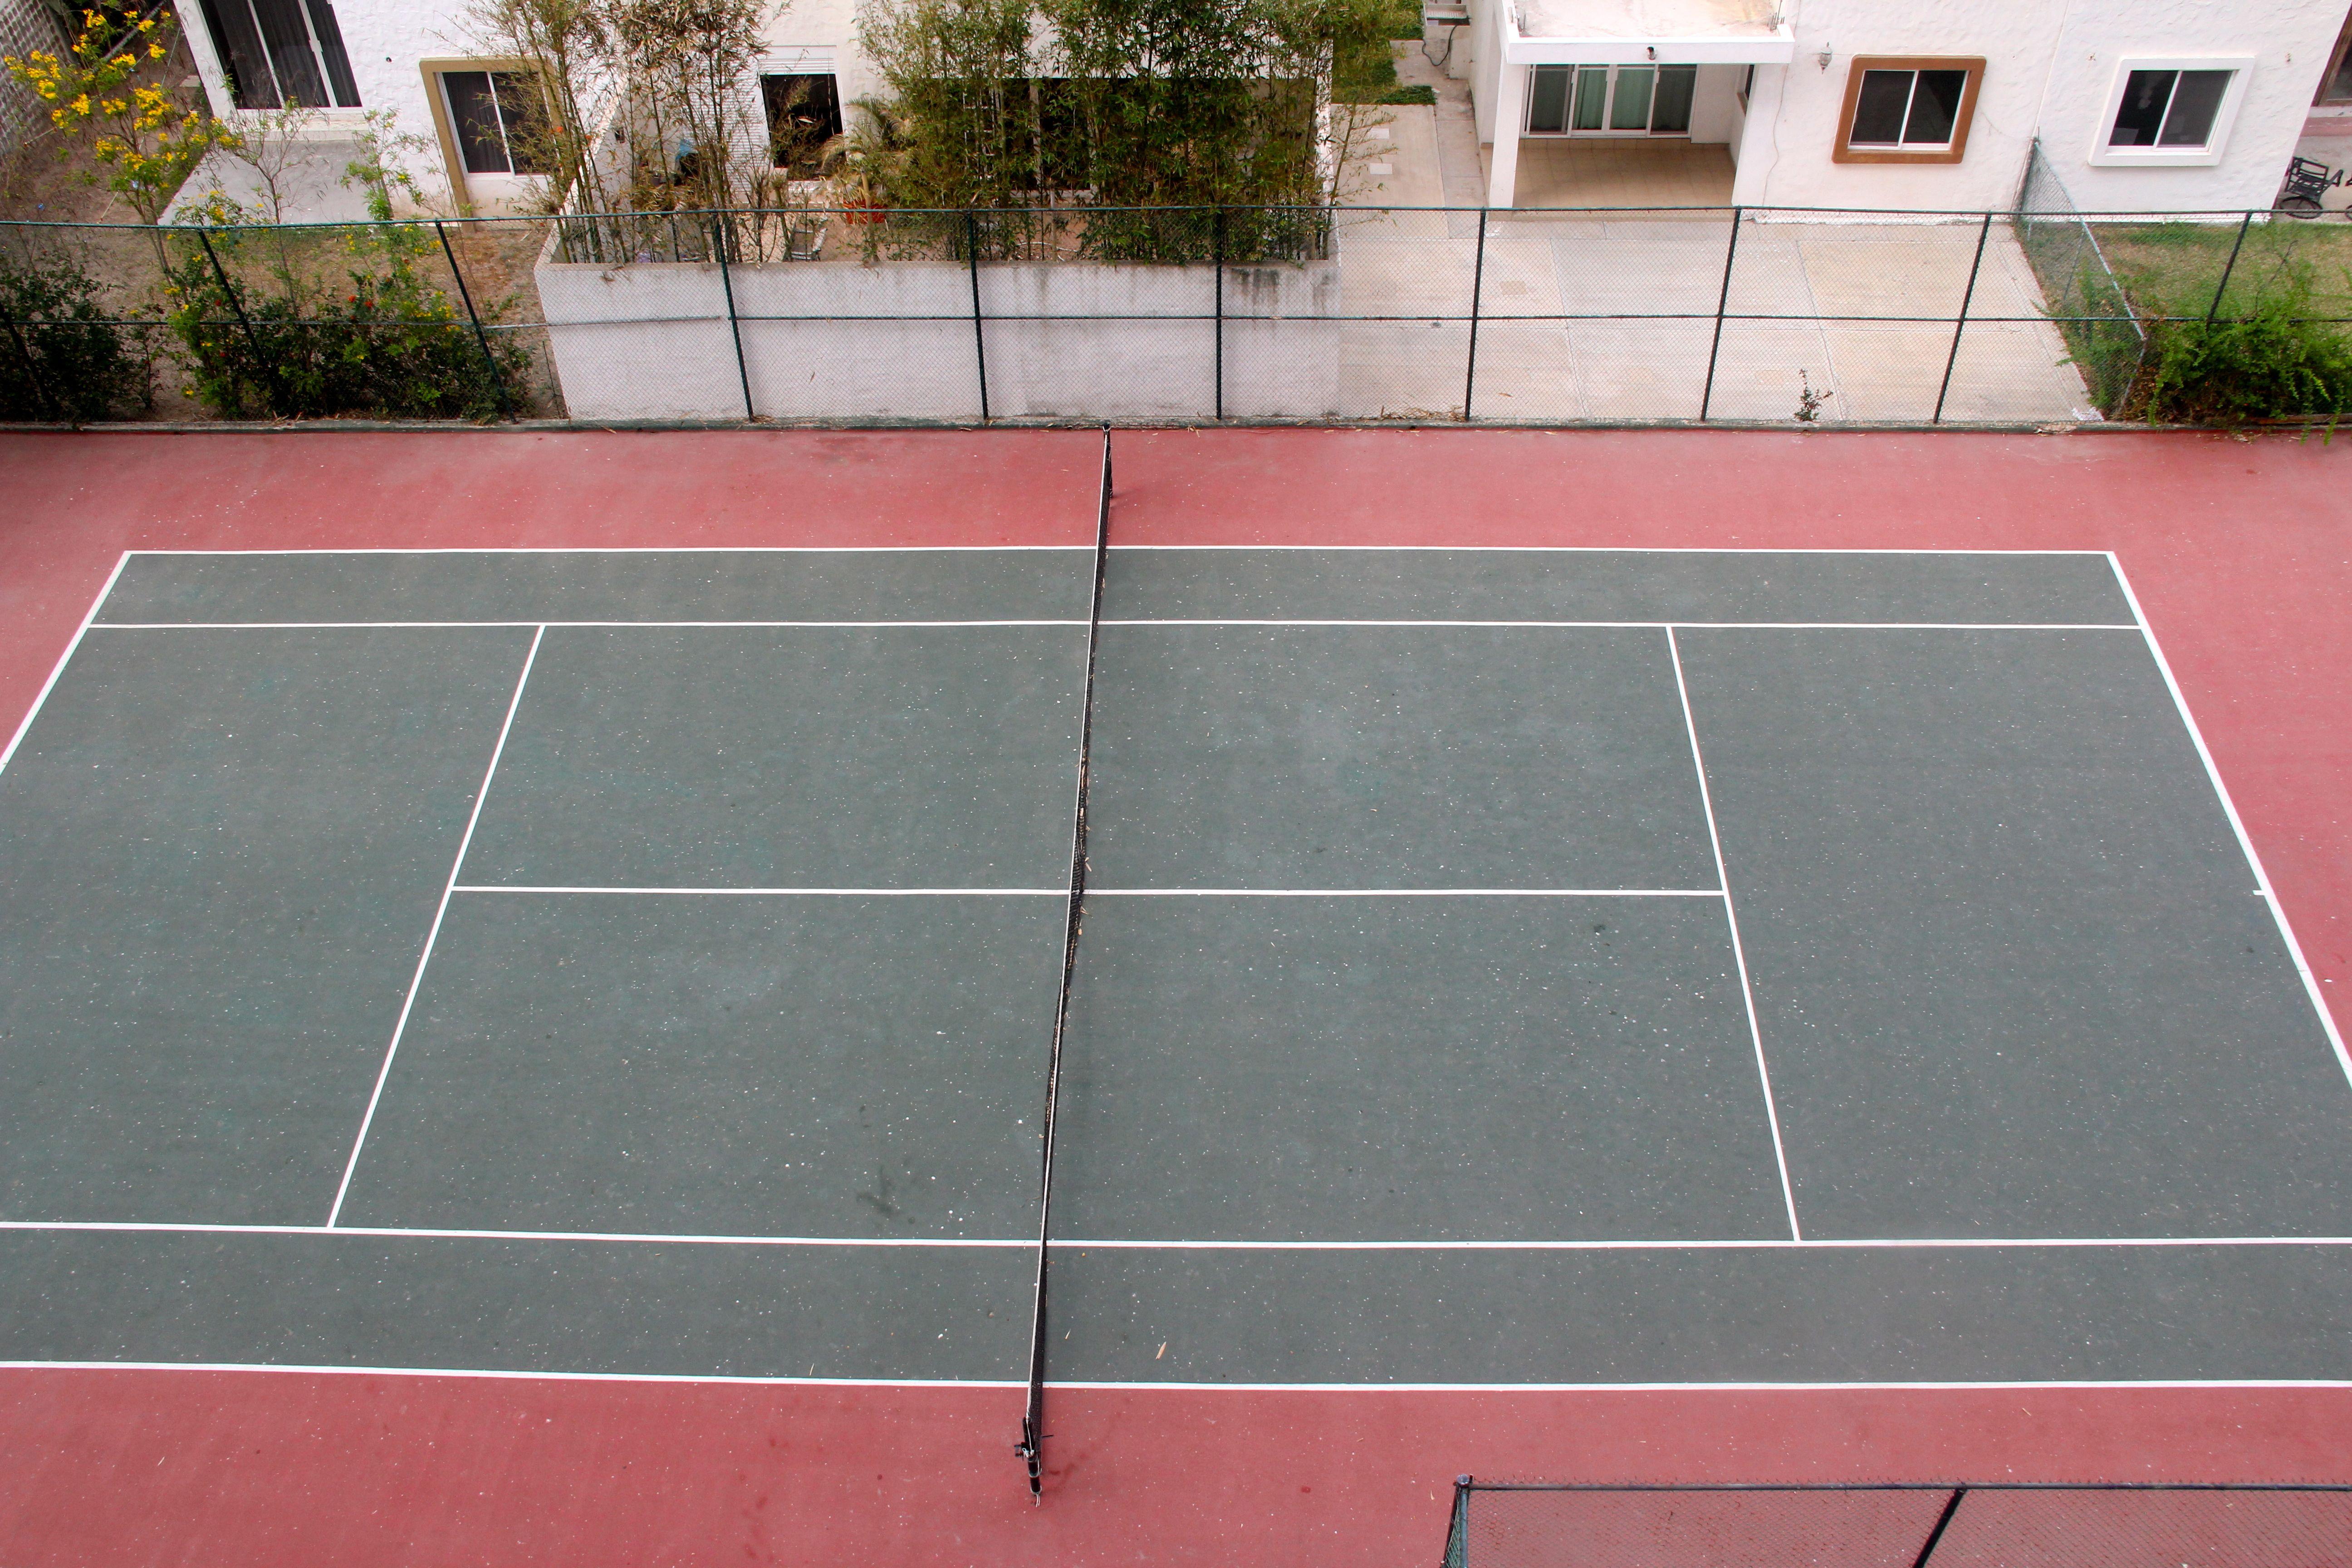 Cancha de tenis en Quintas del Mar